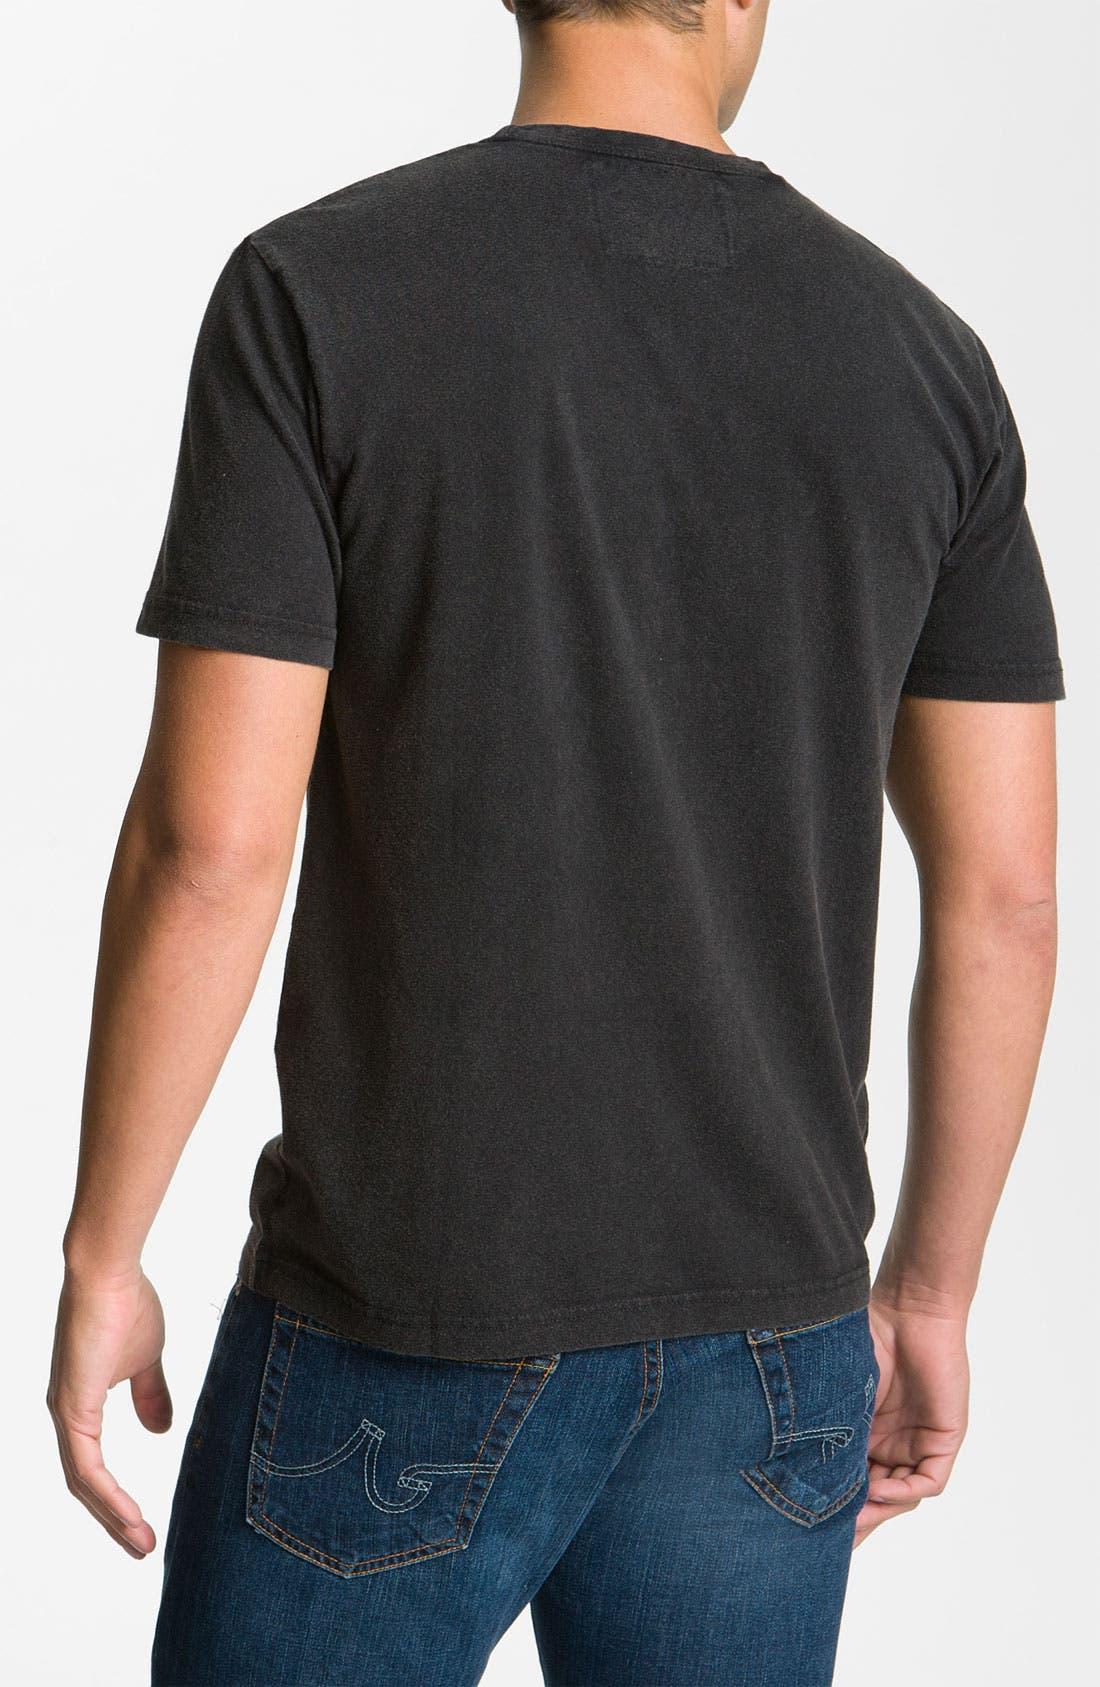 Alternate Image 2  - Red Jacket 'Saitama Seibu Lions' Regular Fit Crewneck T-Shirt (Men)